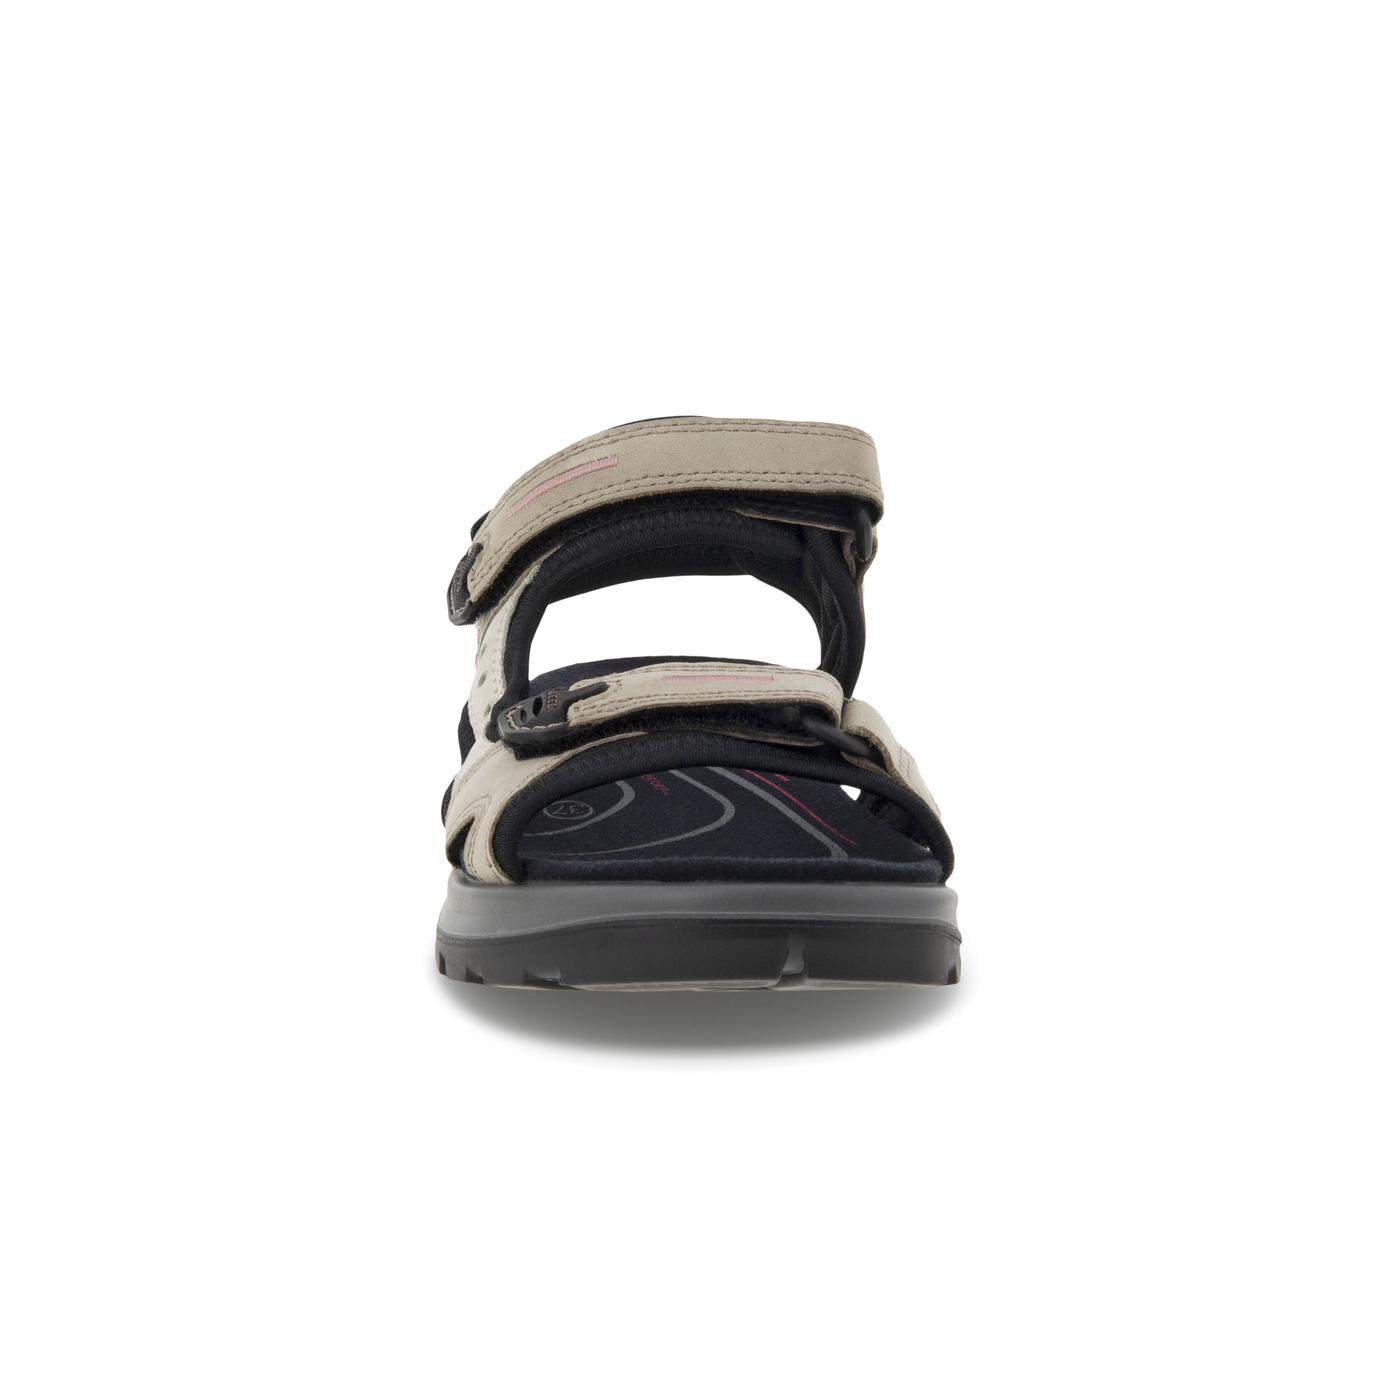 ECCO OFFROAD Ladies Sandal